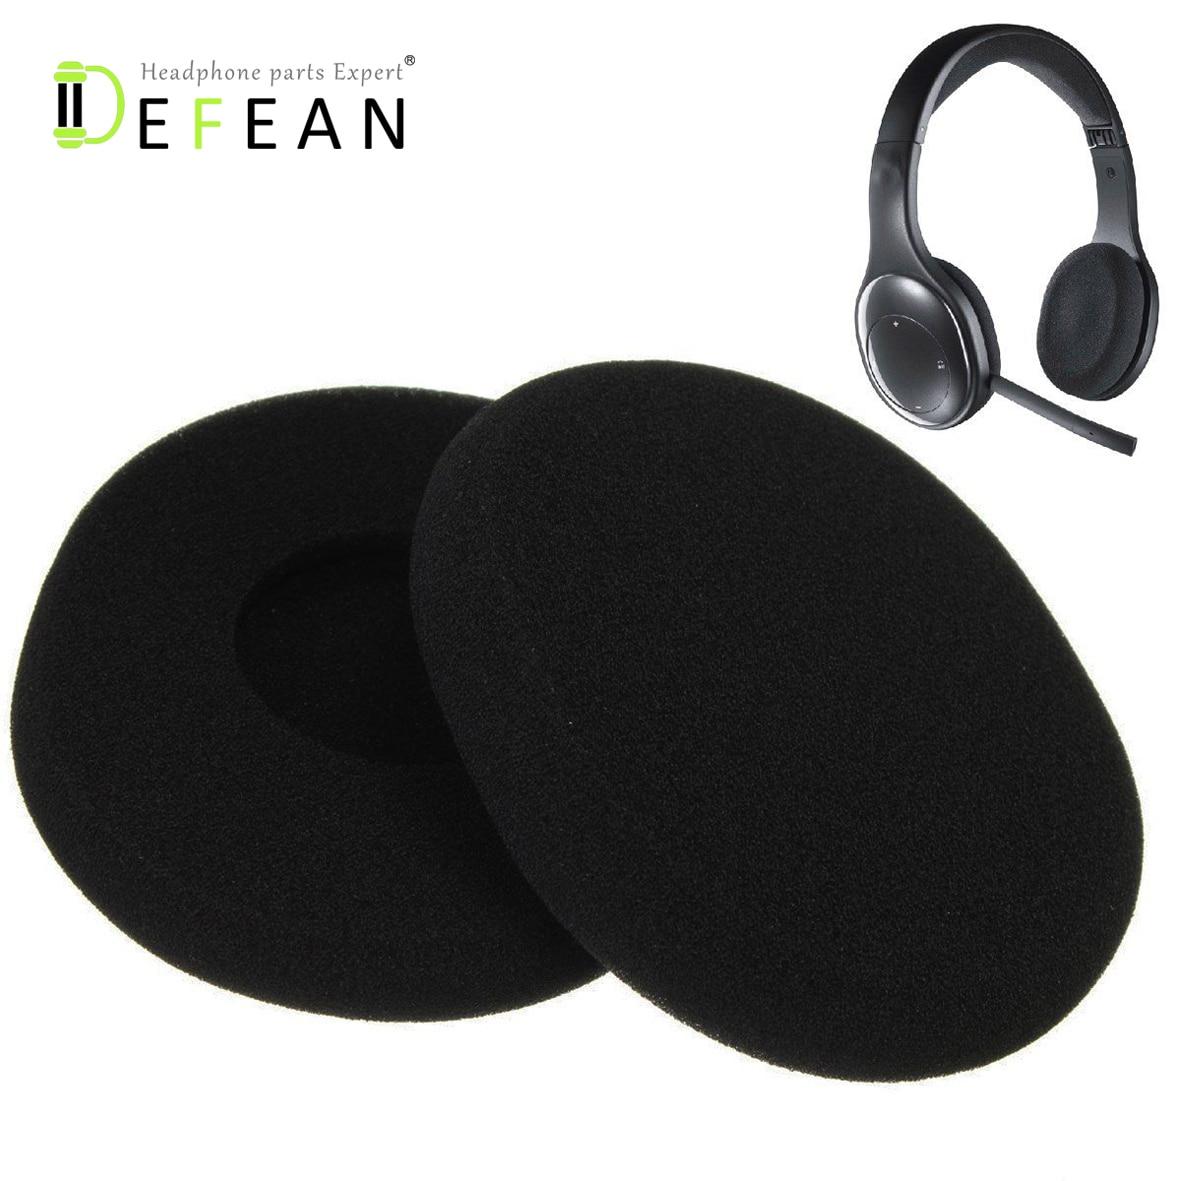 Defean A Pair Of Replacement Foam Earpads Ear Pads Ear Cushions For Logitech Wireless Headset H800 Headphones Ear Cushions Replacement Ear Cushionsear Cushions For Headphones Aliexpress